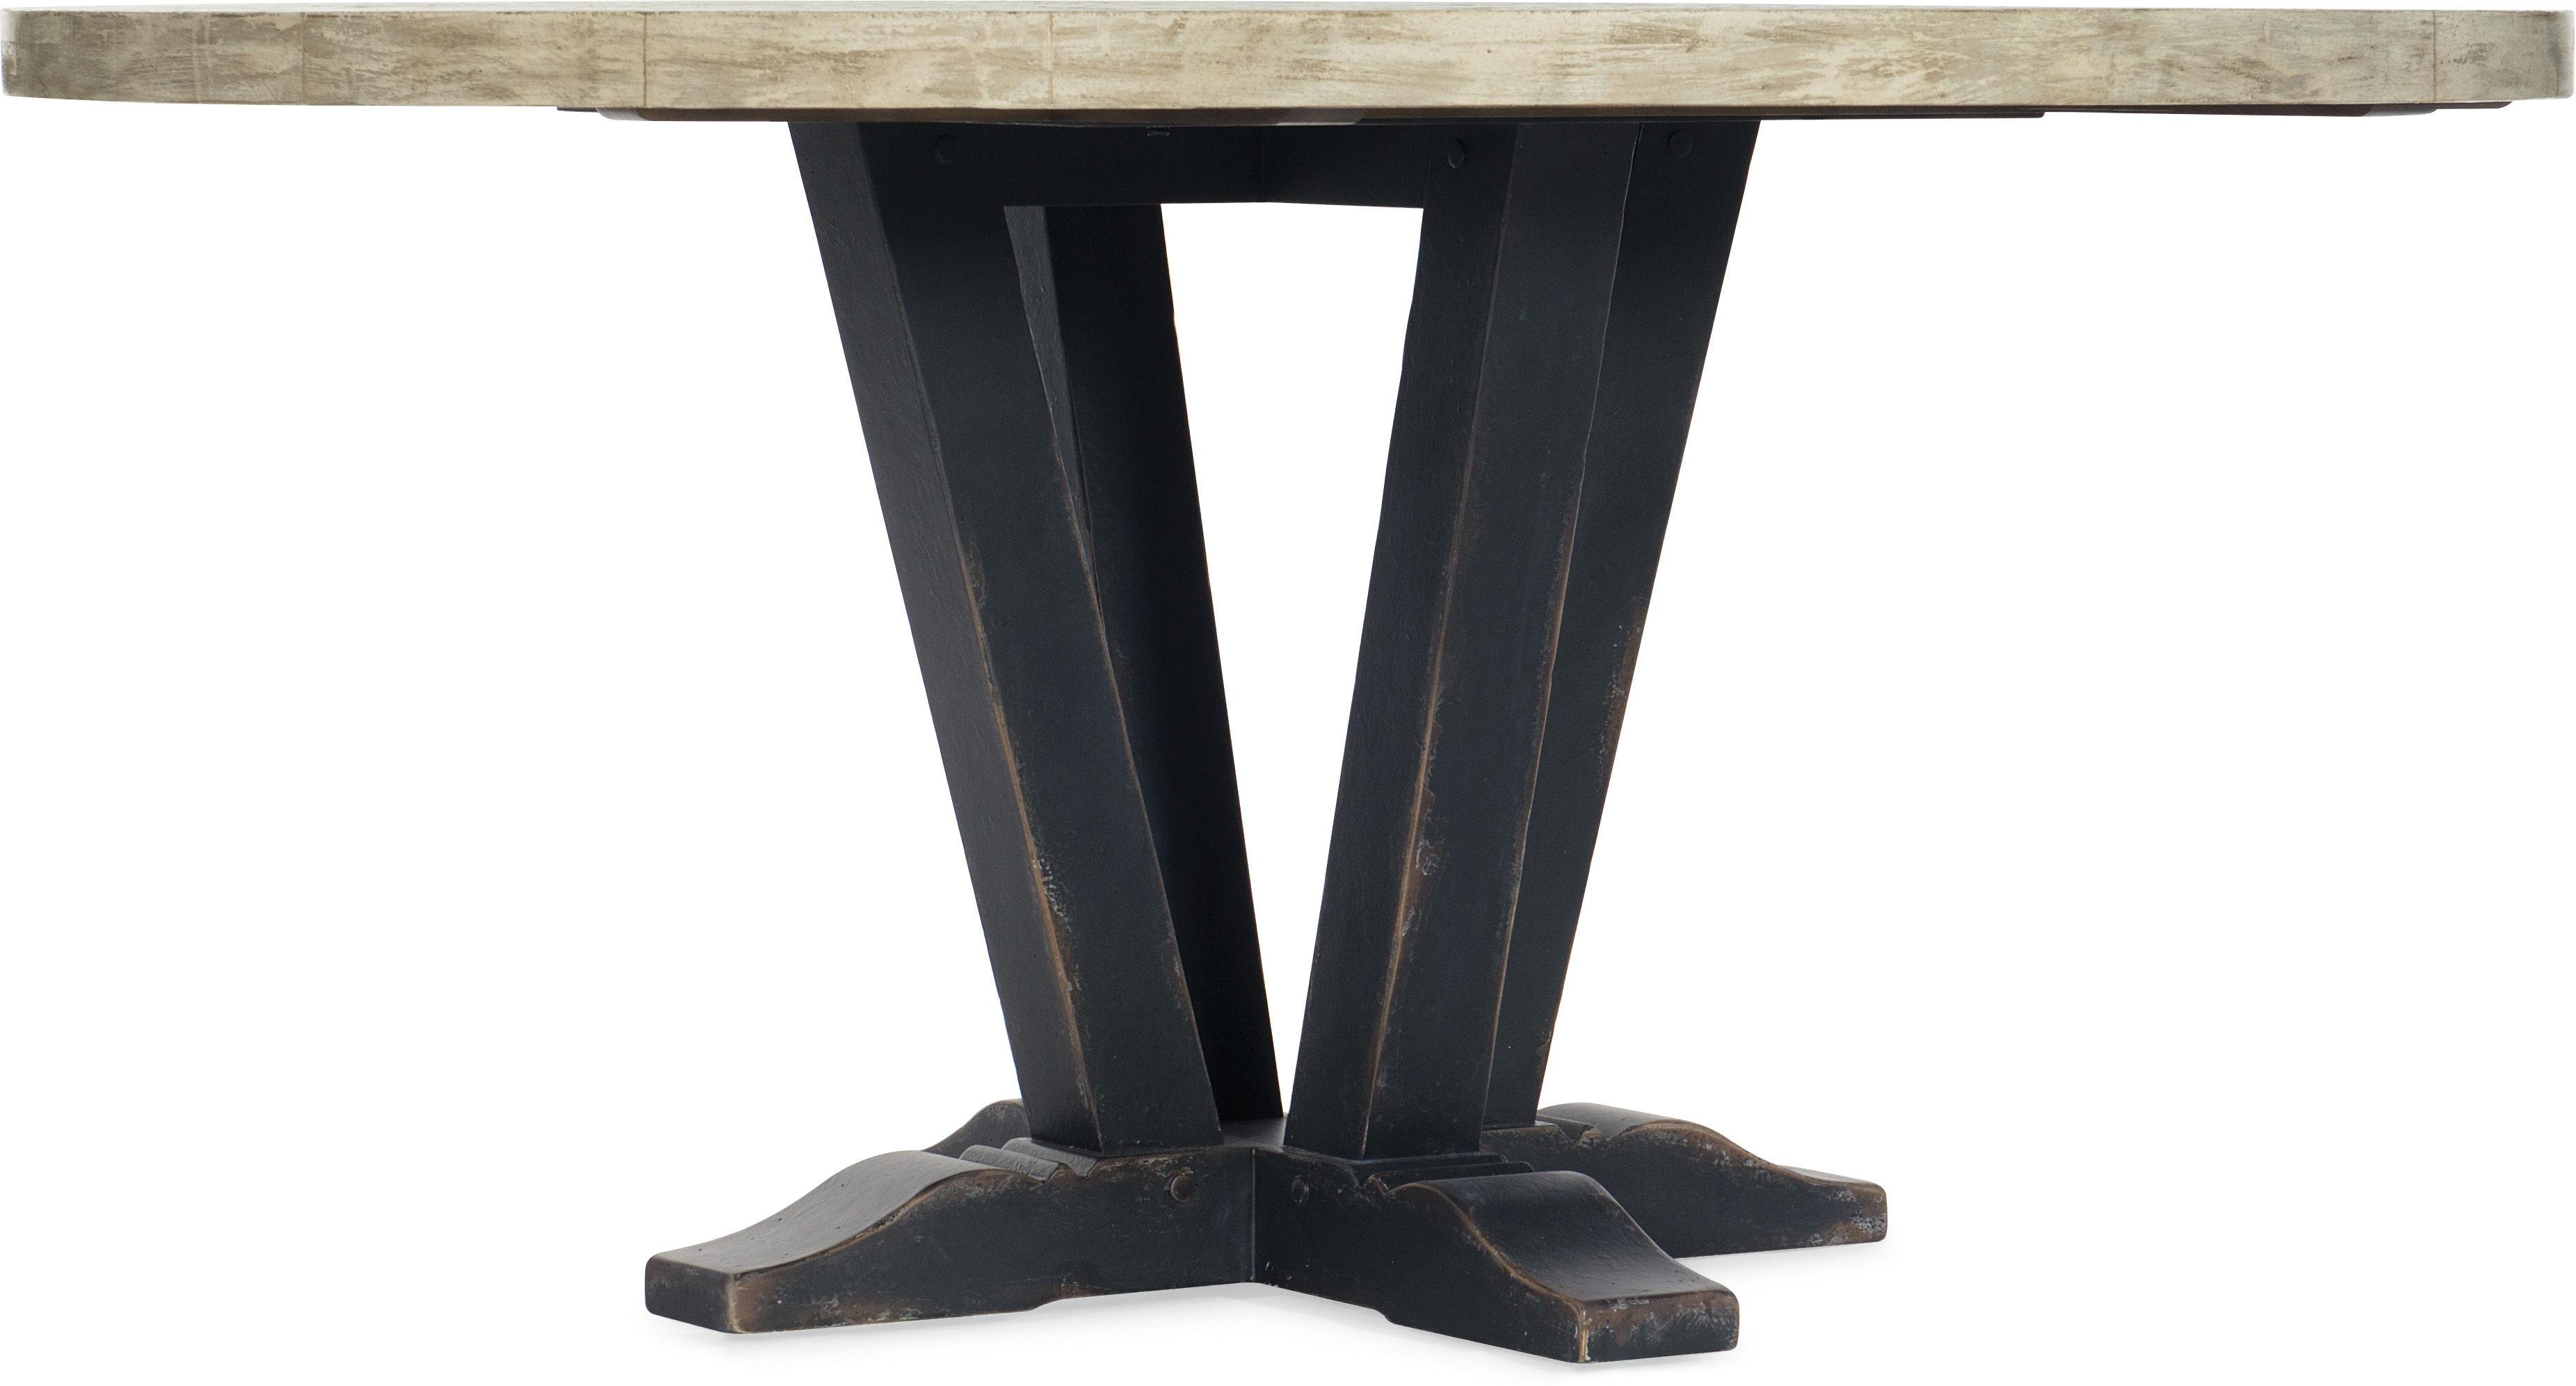 60in Round Dining Table santa barbara design center hooker furniture 5805-75203-80